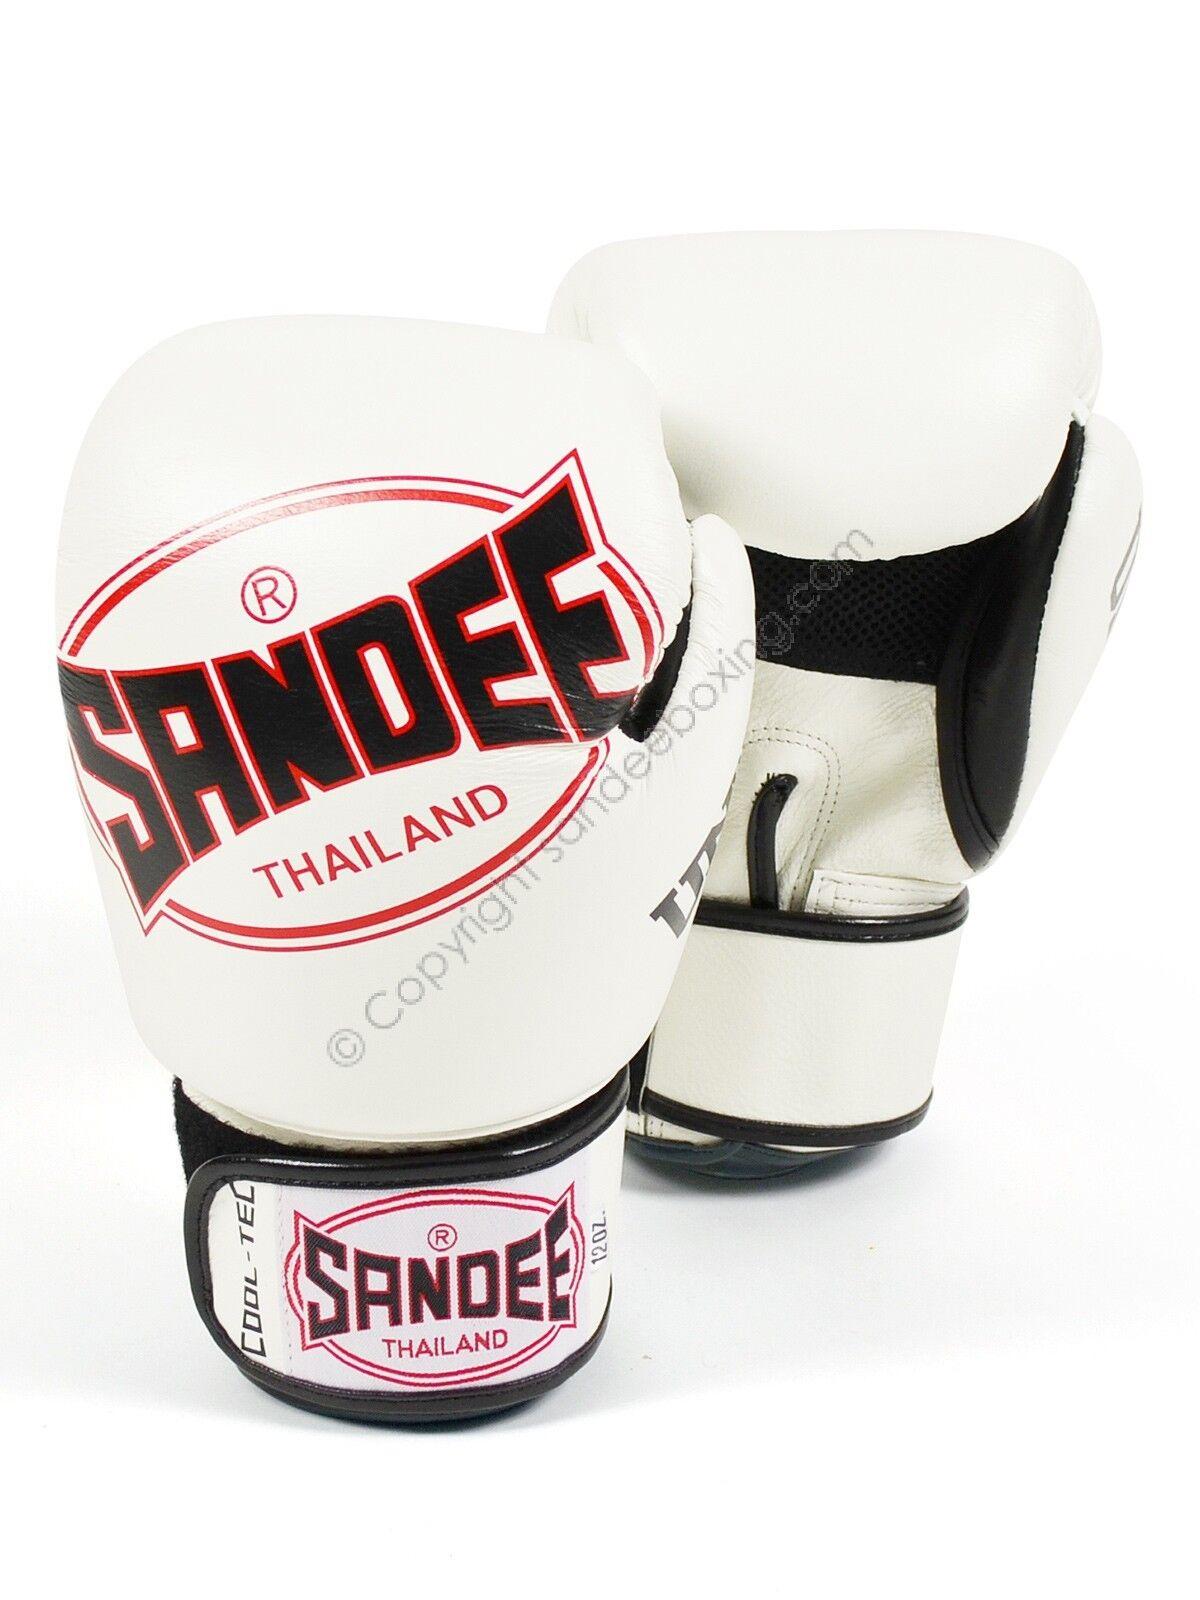 Sandee Kinder Cool-Tec weiß Boxhandschuhe Kinder Kinder Kinder Boxhandschuhe fdfa69